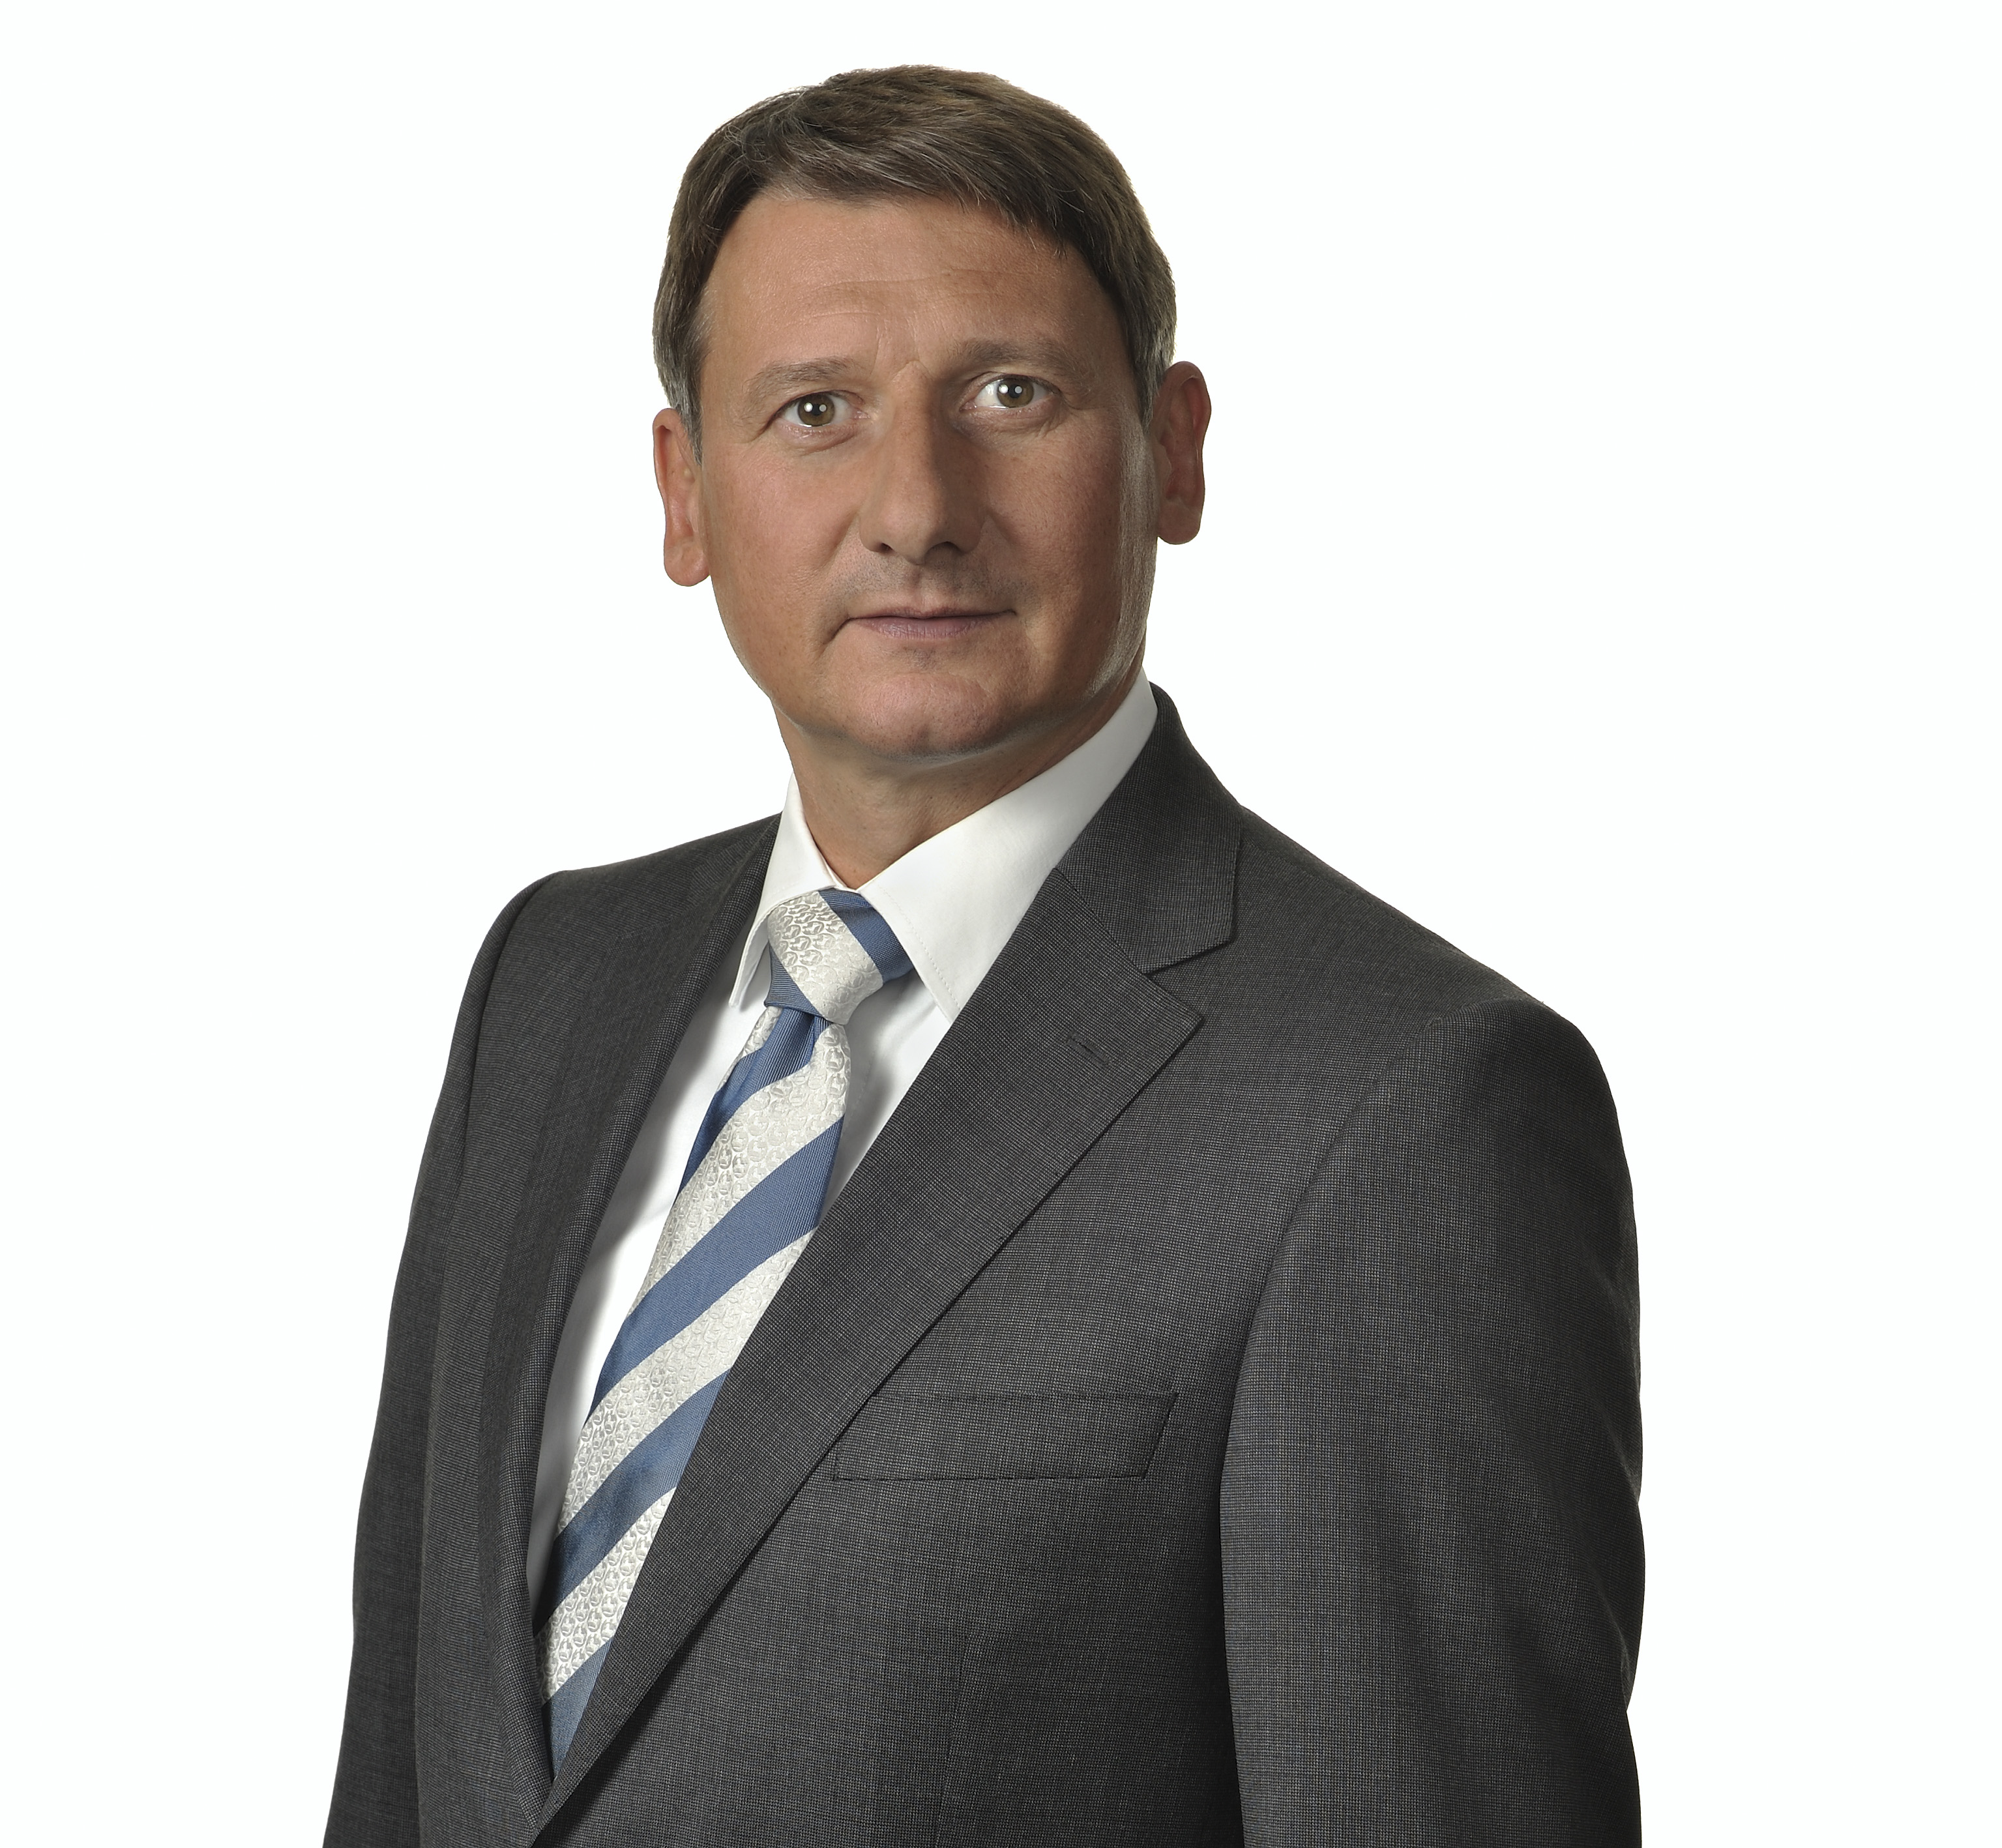 Hanekopf Ab 2015 Ovb Vorstand Herbert Frommes Versicherungsmonitor